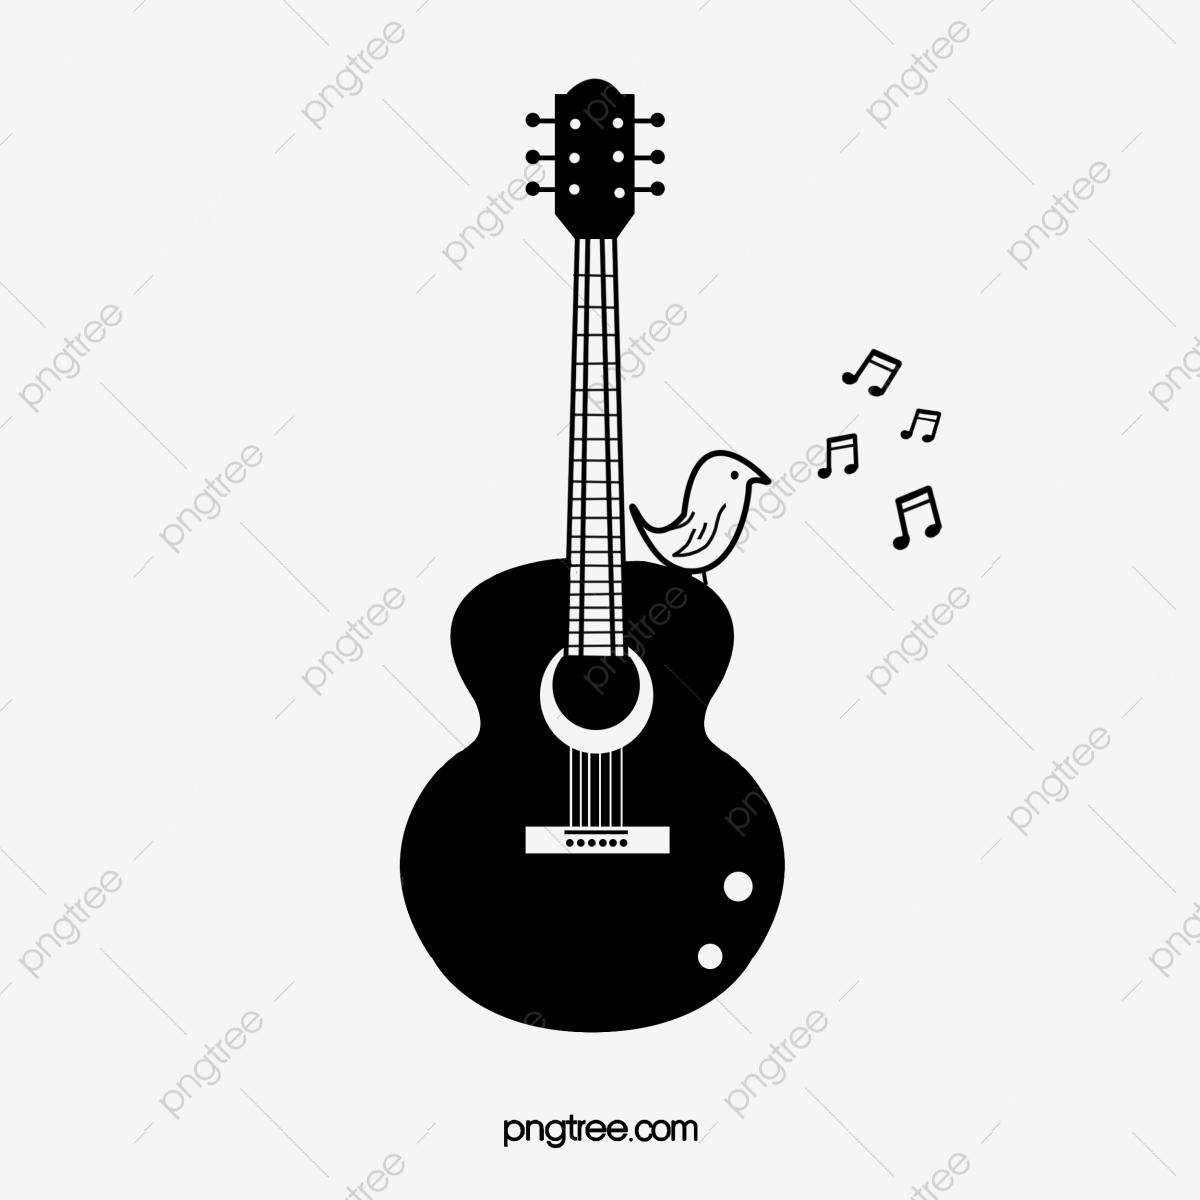 Guitarra Desenho De Guitarra Desenho De Guitarra Simples De